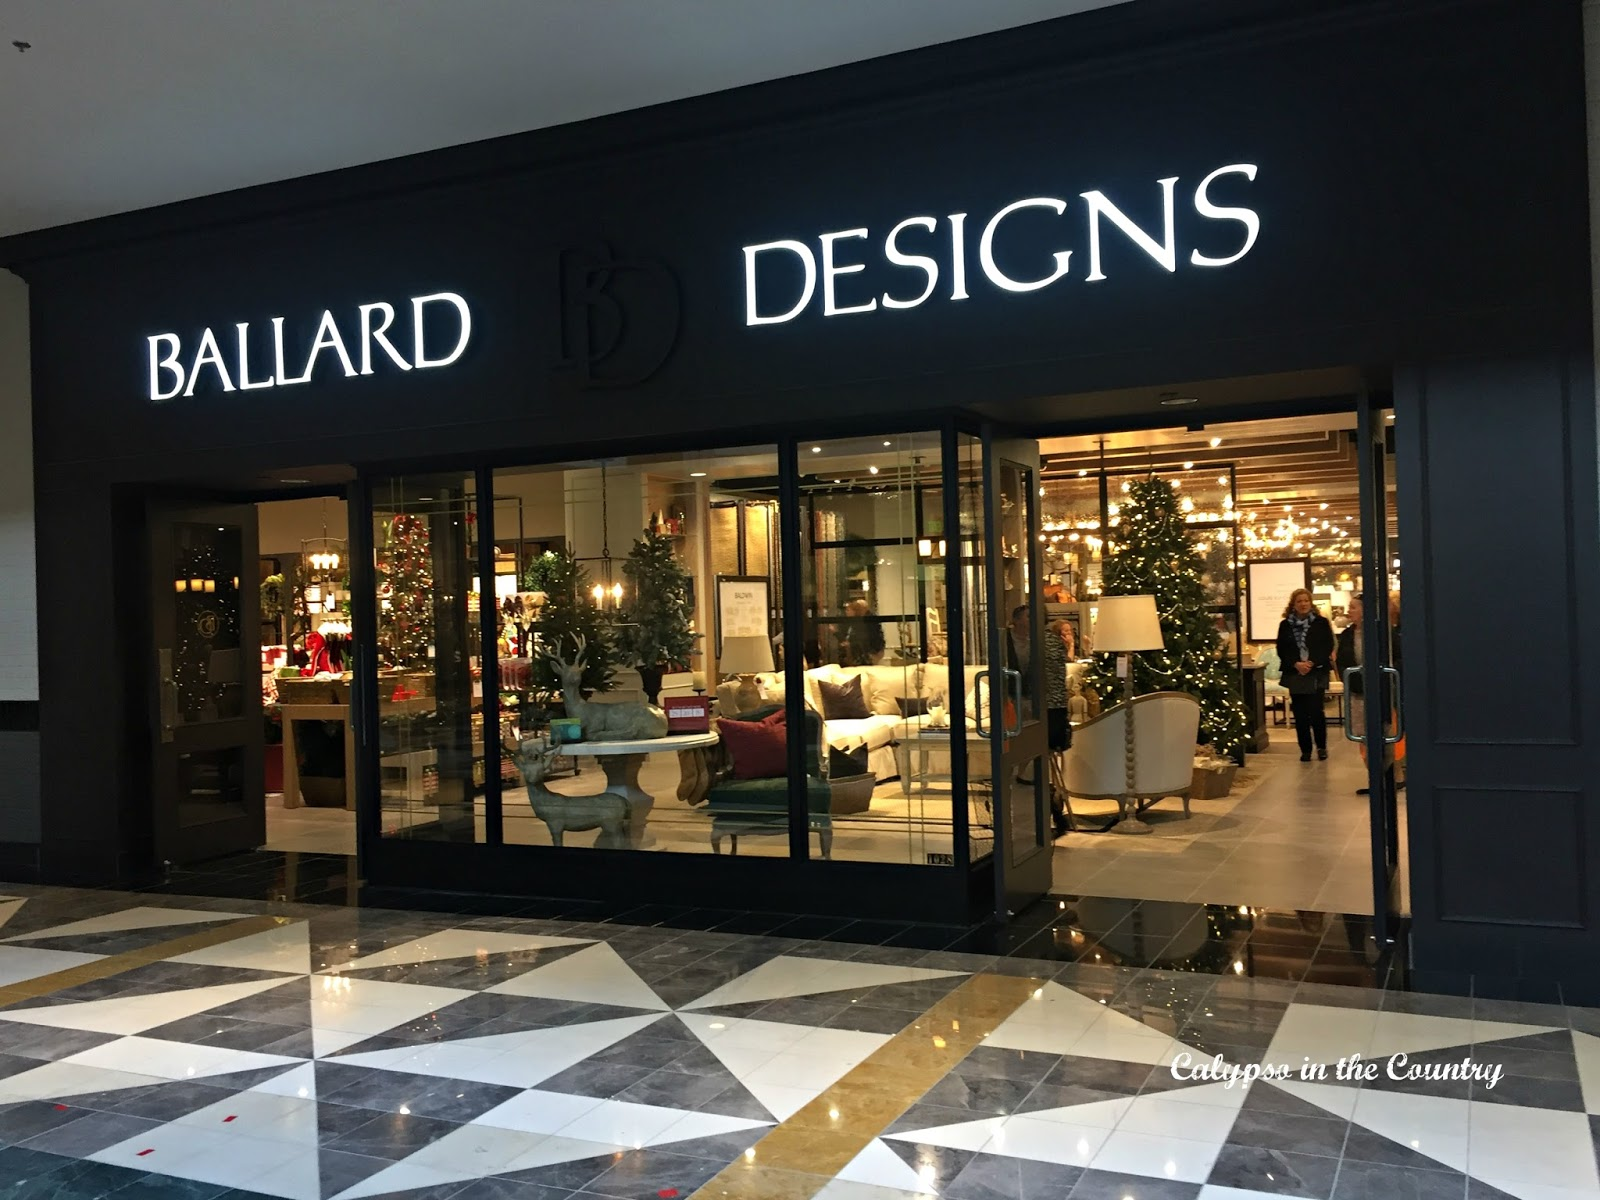 ballard store best ballard designs opens in tysons corner calypso in the country my road trip to the new ballard store